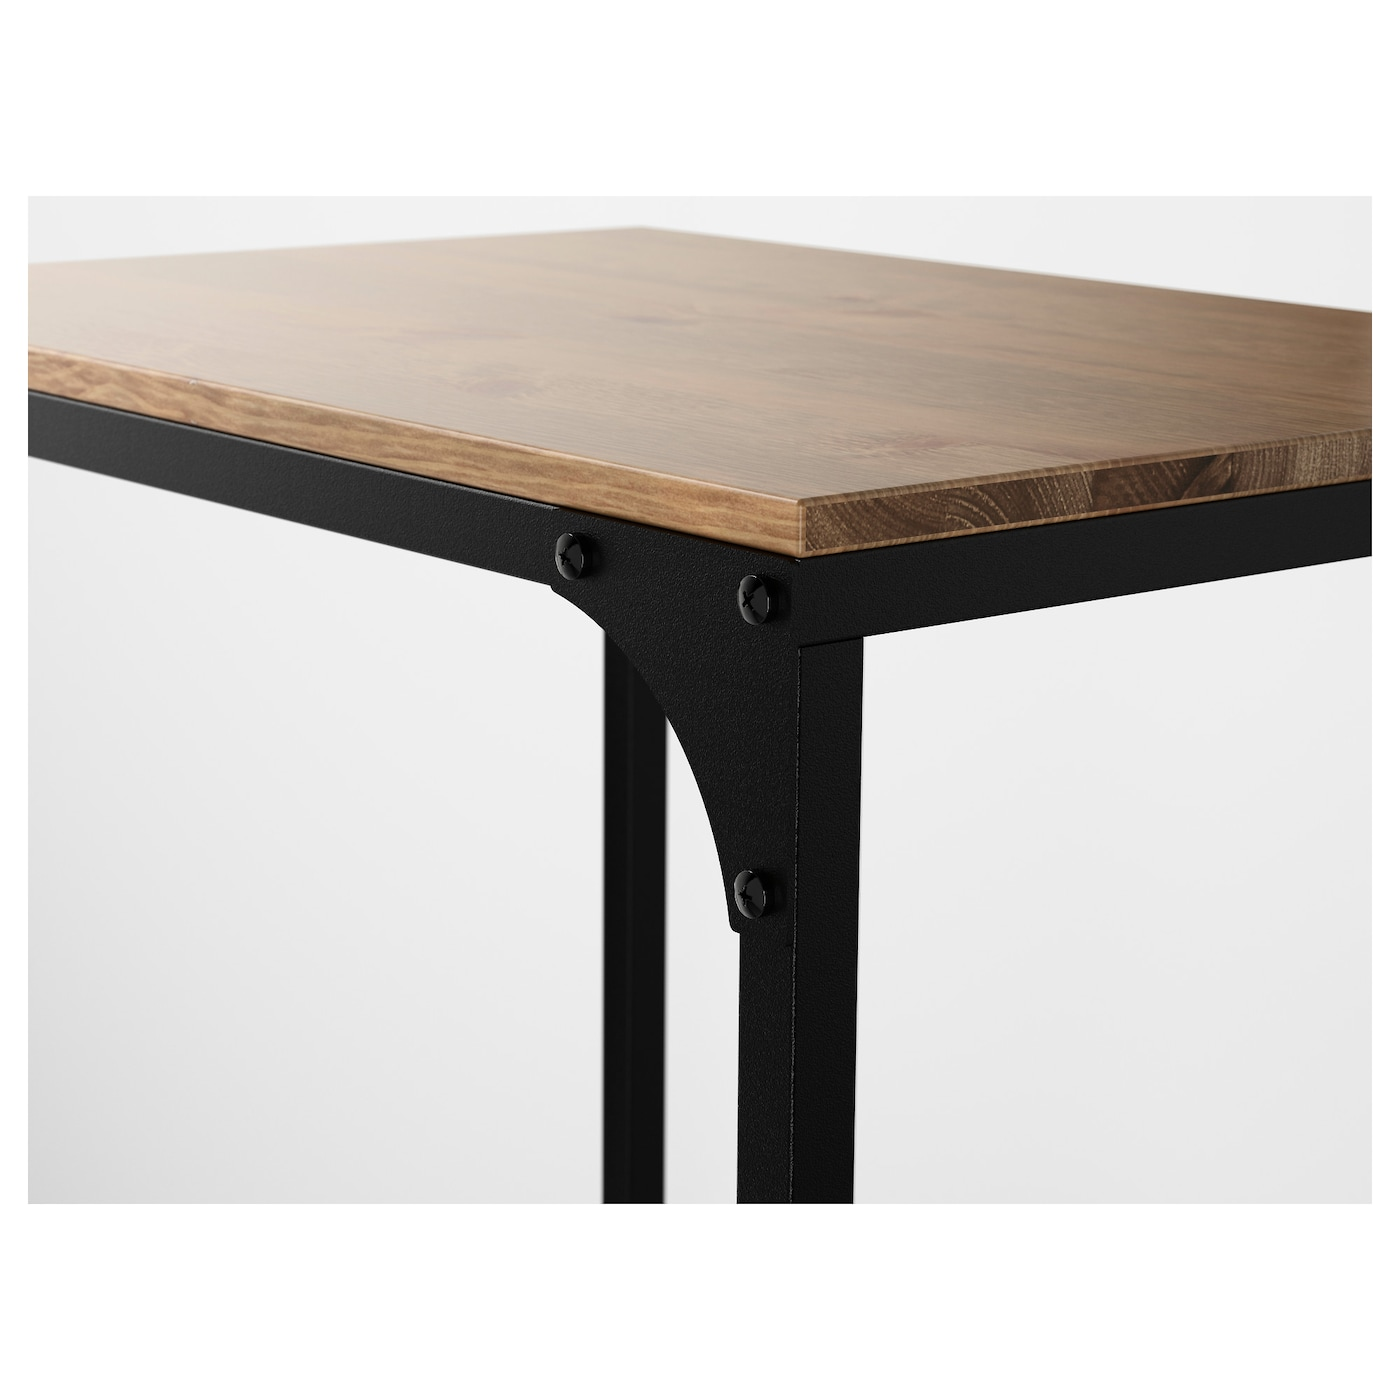 fj llbo combinaison meuble tv noir 250 x 36 x 93 cm ikea. Black Bedroom Furniture Sets. Home Design Ideas